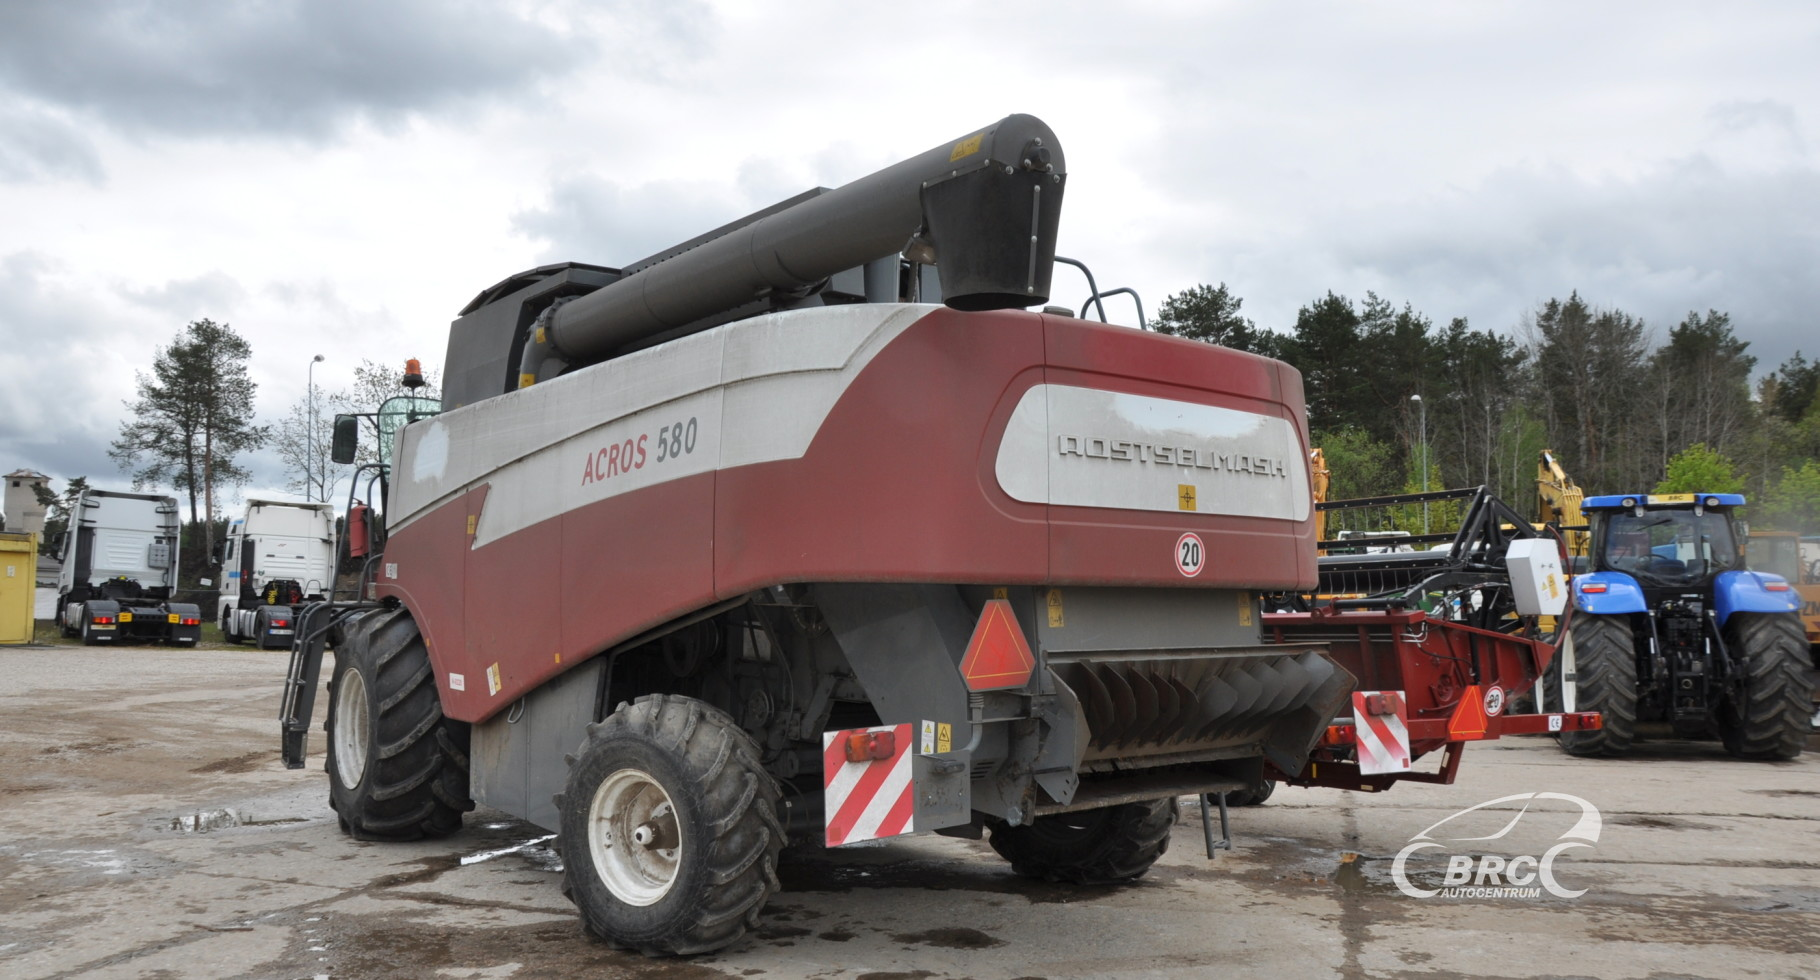 Rostselmash Acros 580